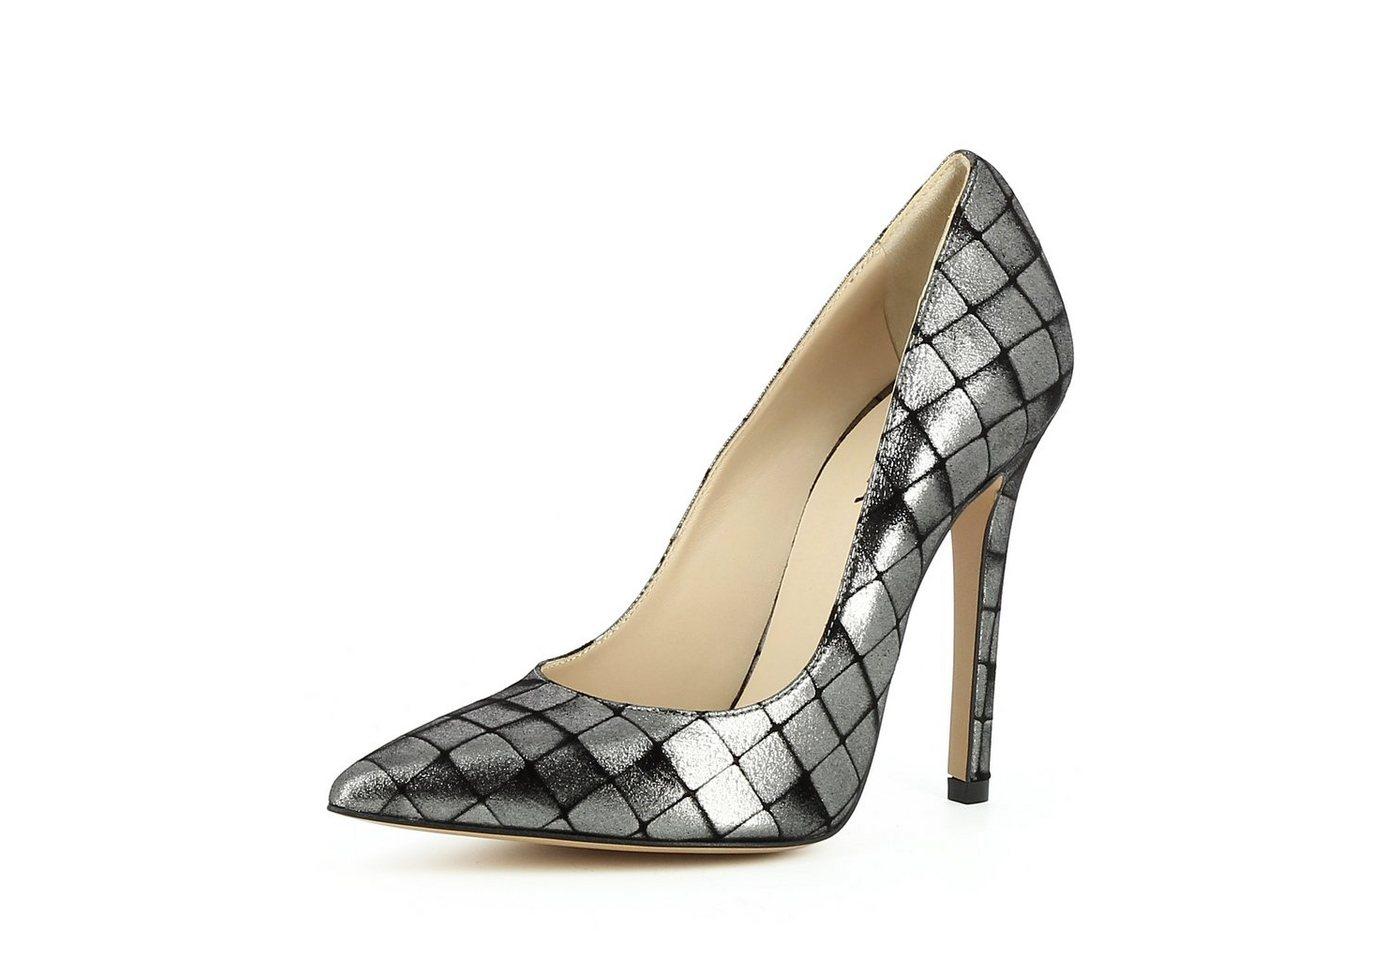 Evita »LISA« High-Heel-Pumps | Schuhe > High Heels > High Heel Pumps | Evita